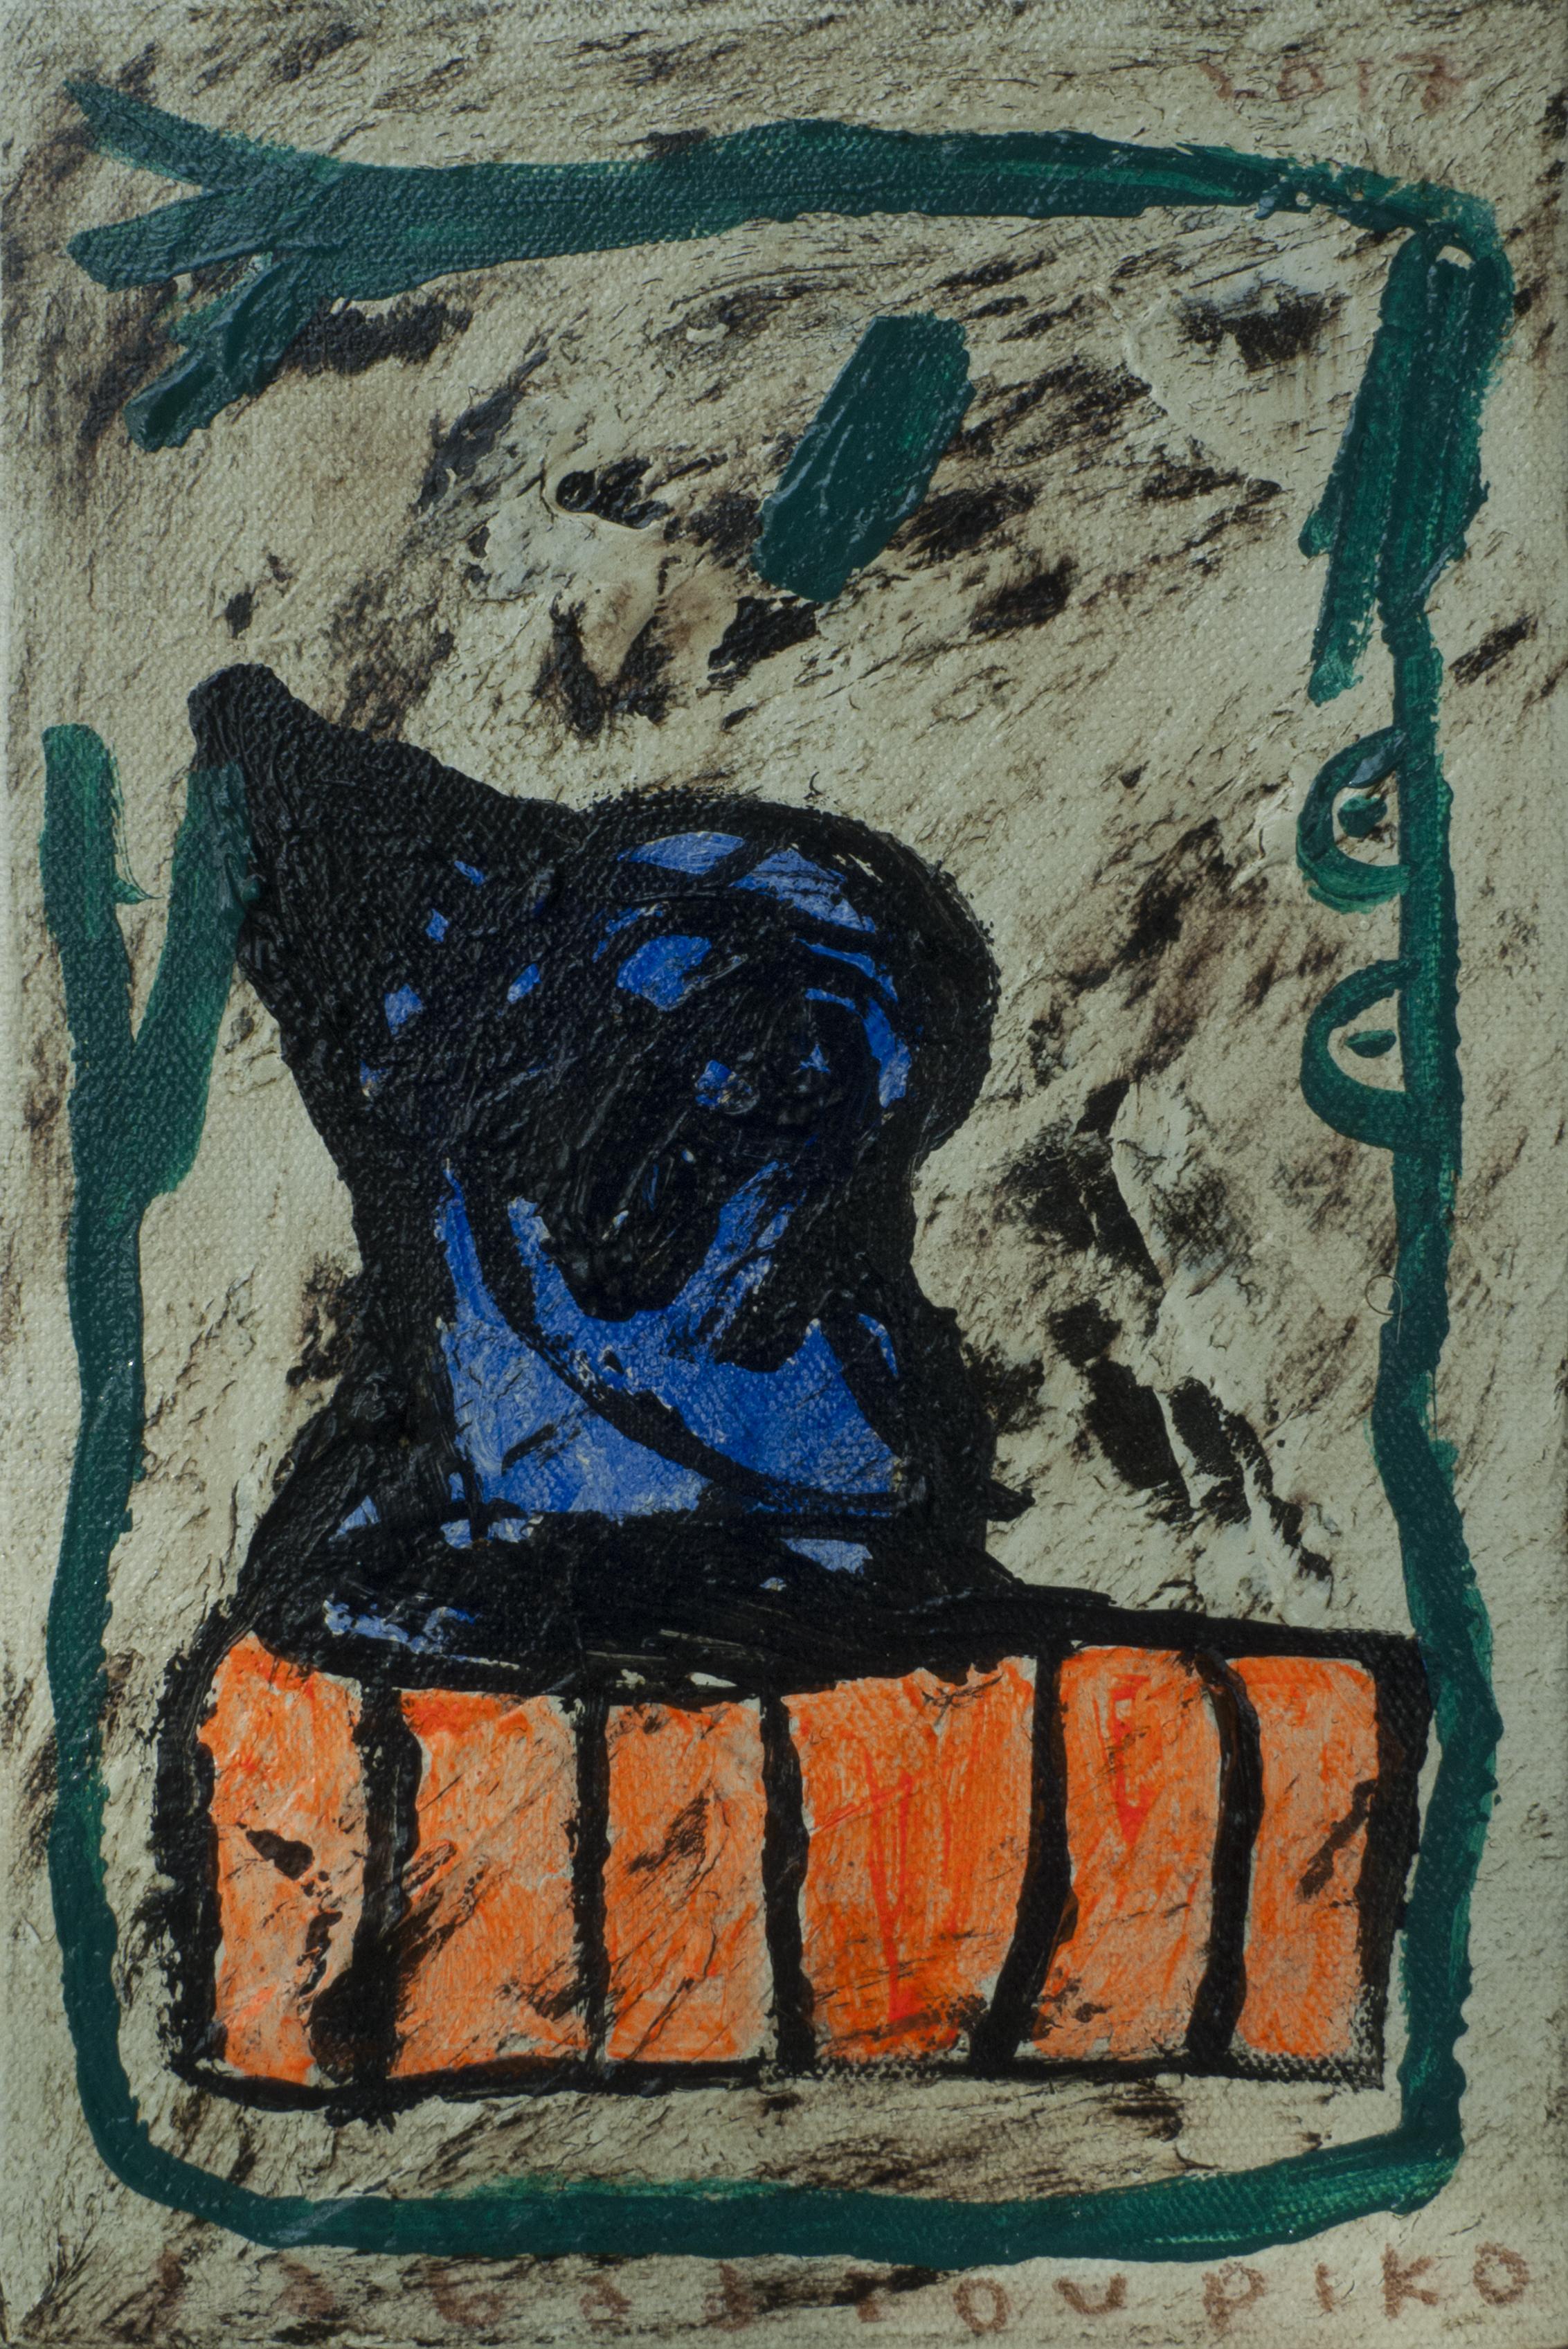 Iabadiou Piko, b.1984 (INDONESIA)  Title: Persepsi Tanpa Tepi  Medium: Mixed Media on Linen Blend  Dimension: 29.7 x 21 cm (part of 24 panel series)  Year: 2017